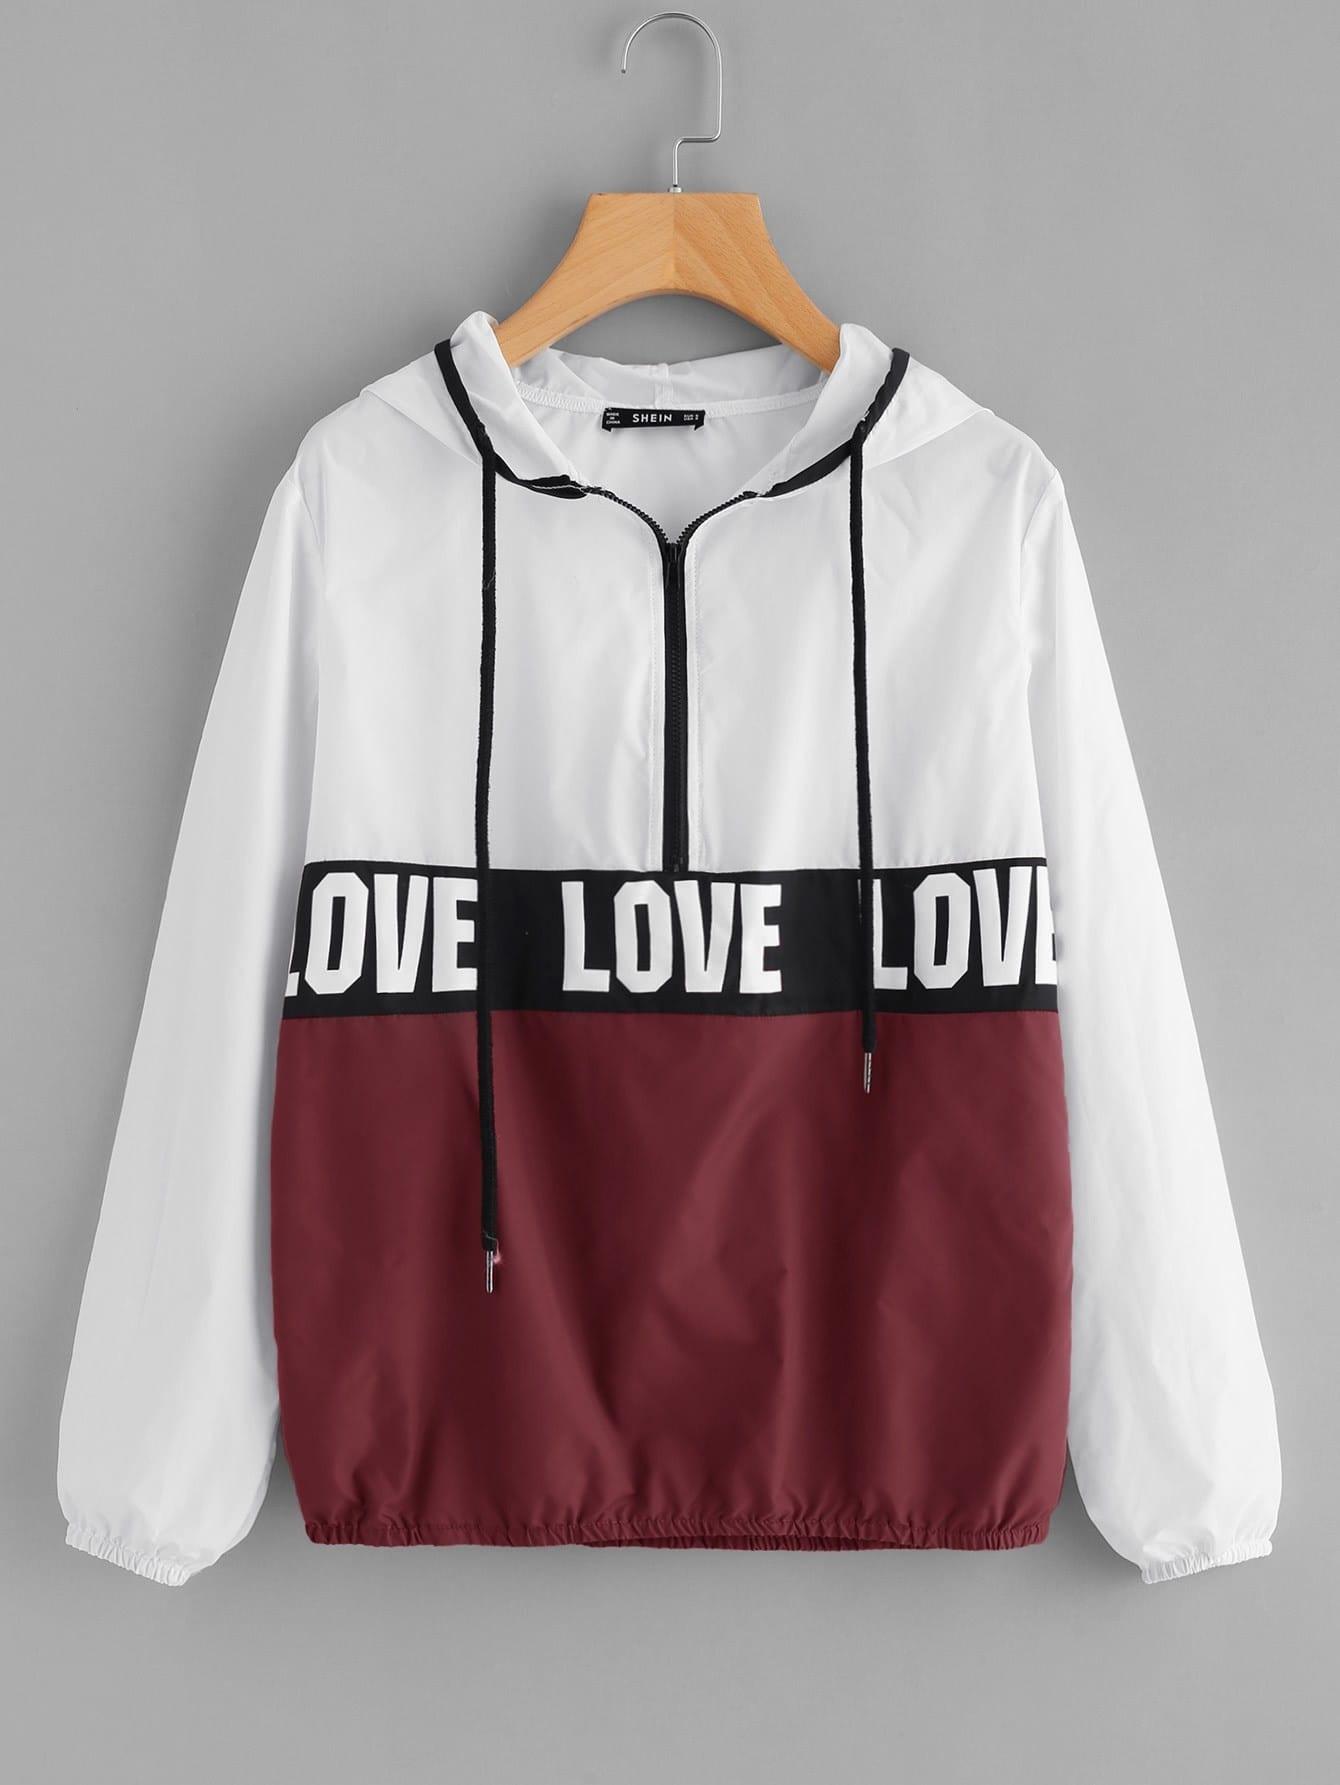 Zip Front LOVE Print Windbreaker Hoodie Jacket letter print zip front casual mens down jacket